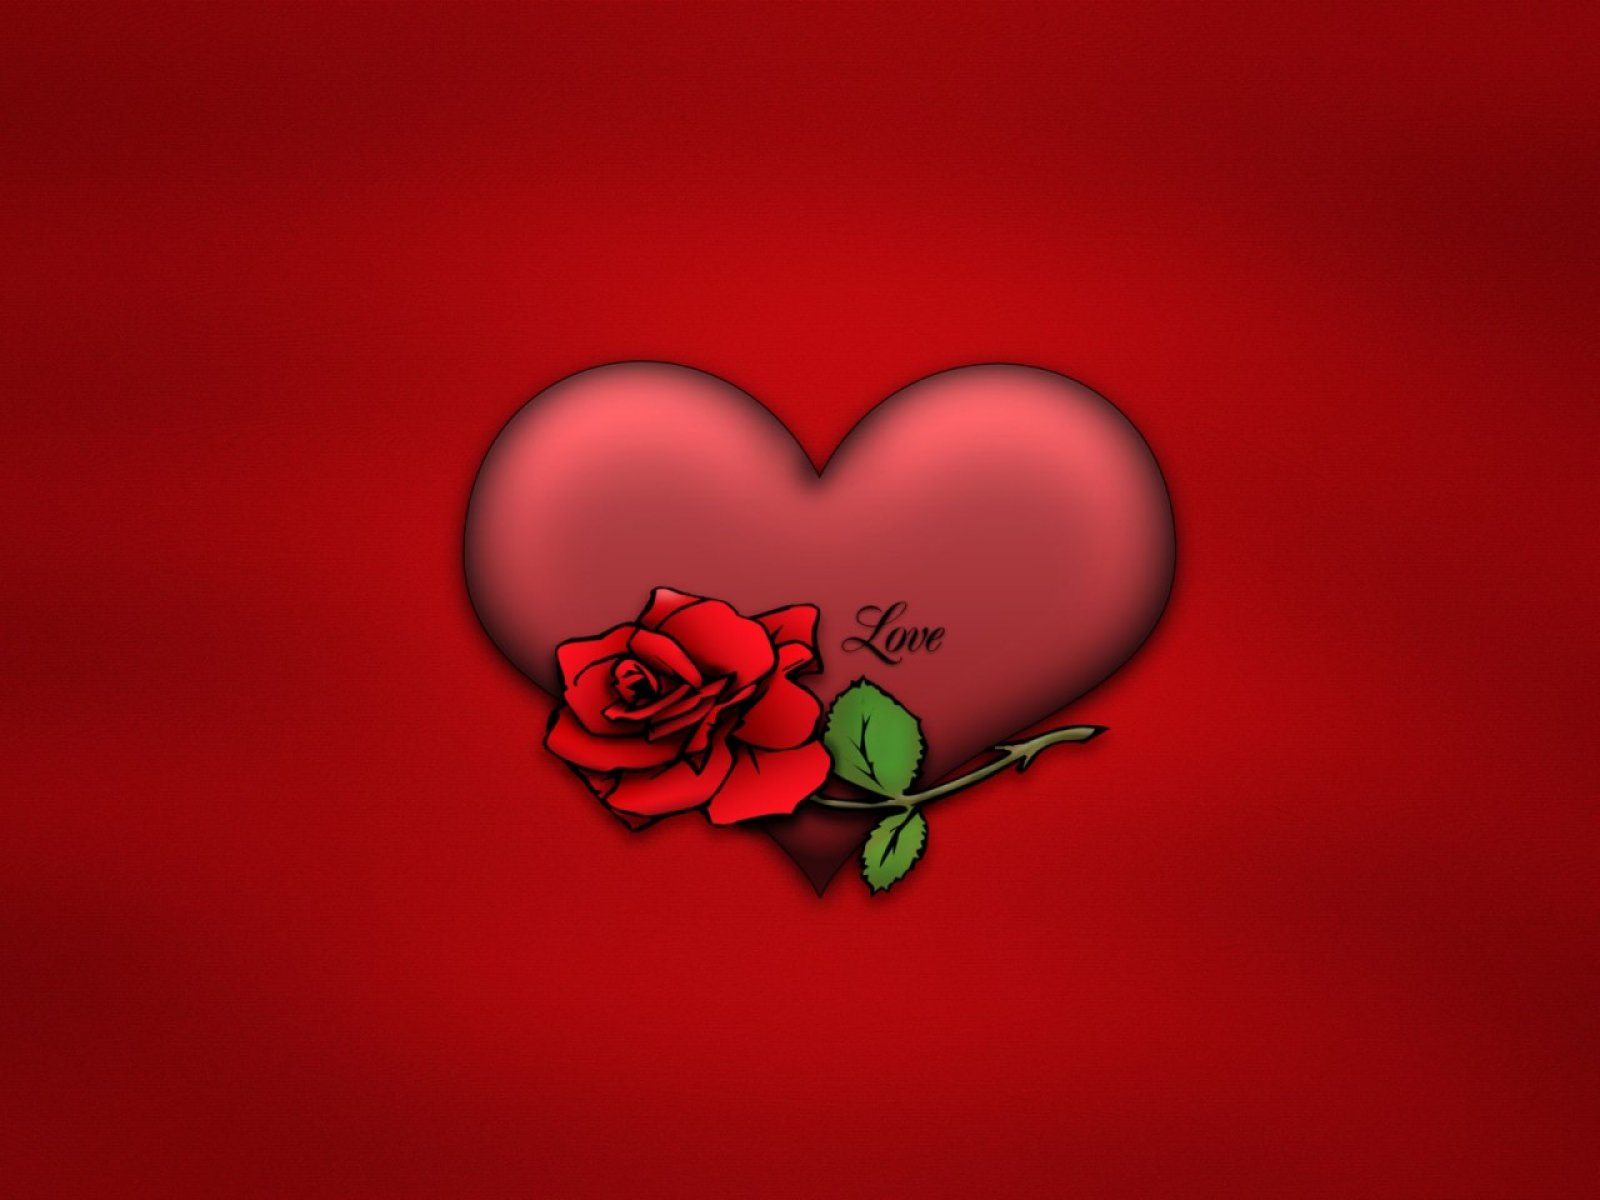 page size 1600x1200 desktop wallpaper of valentine love 1600x1200